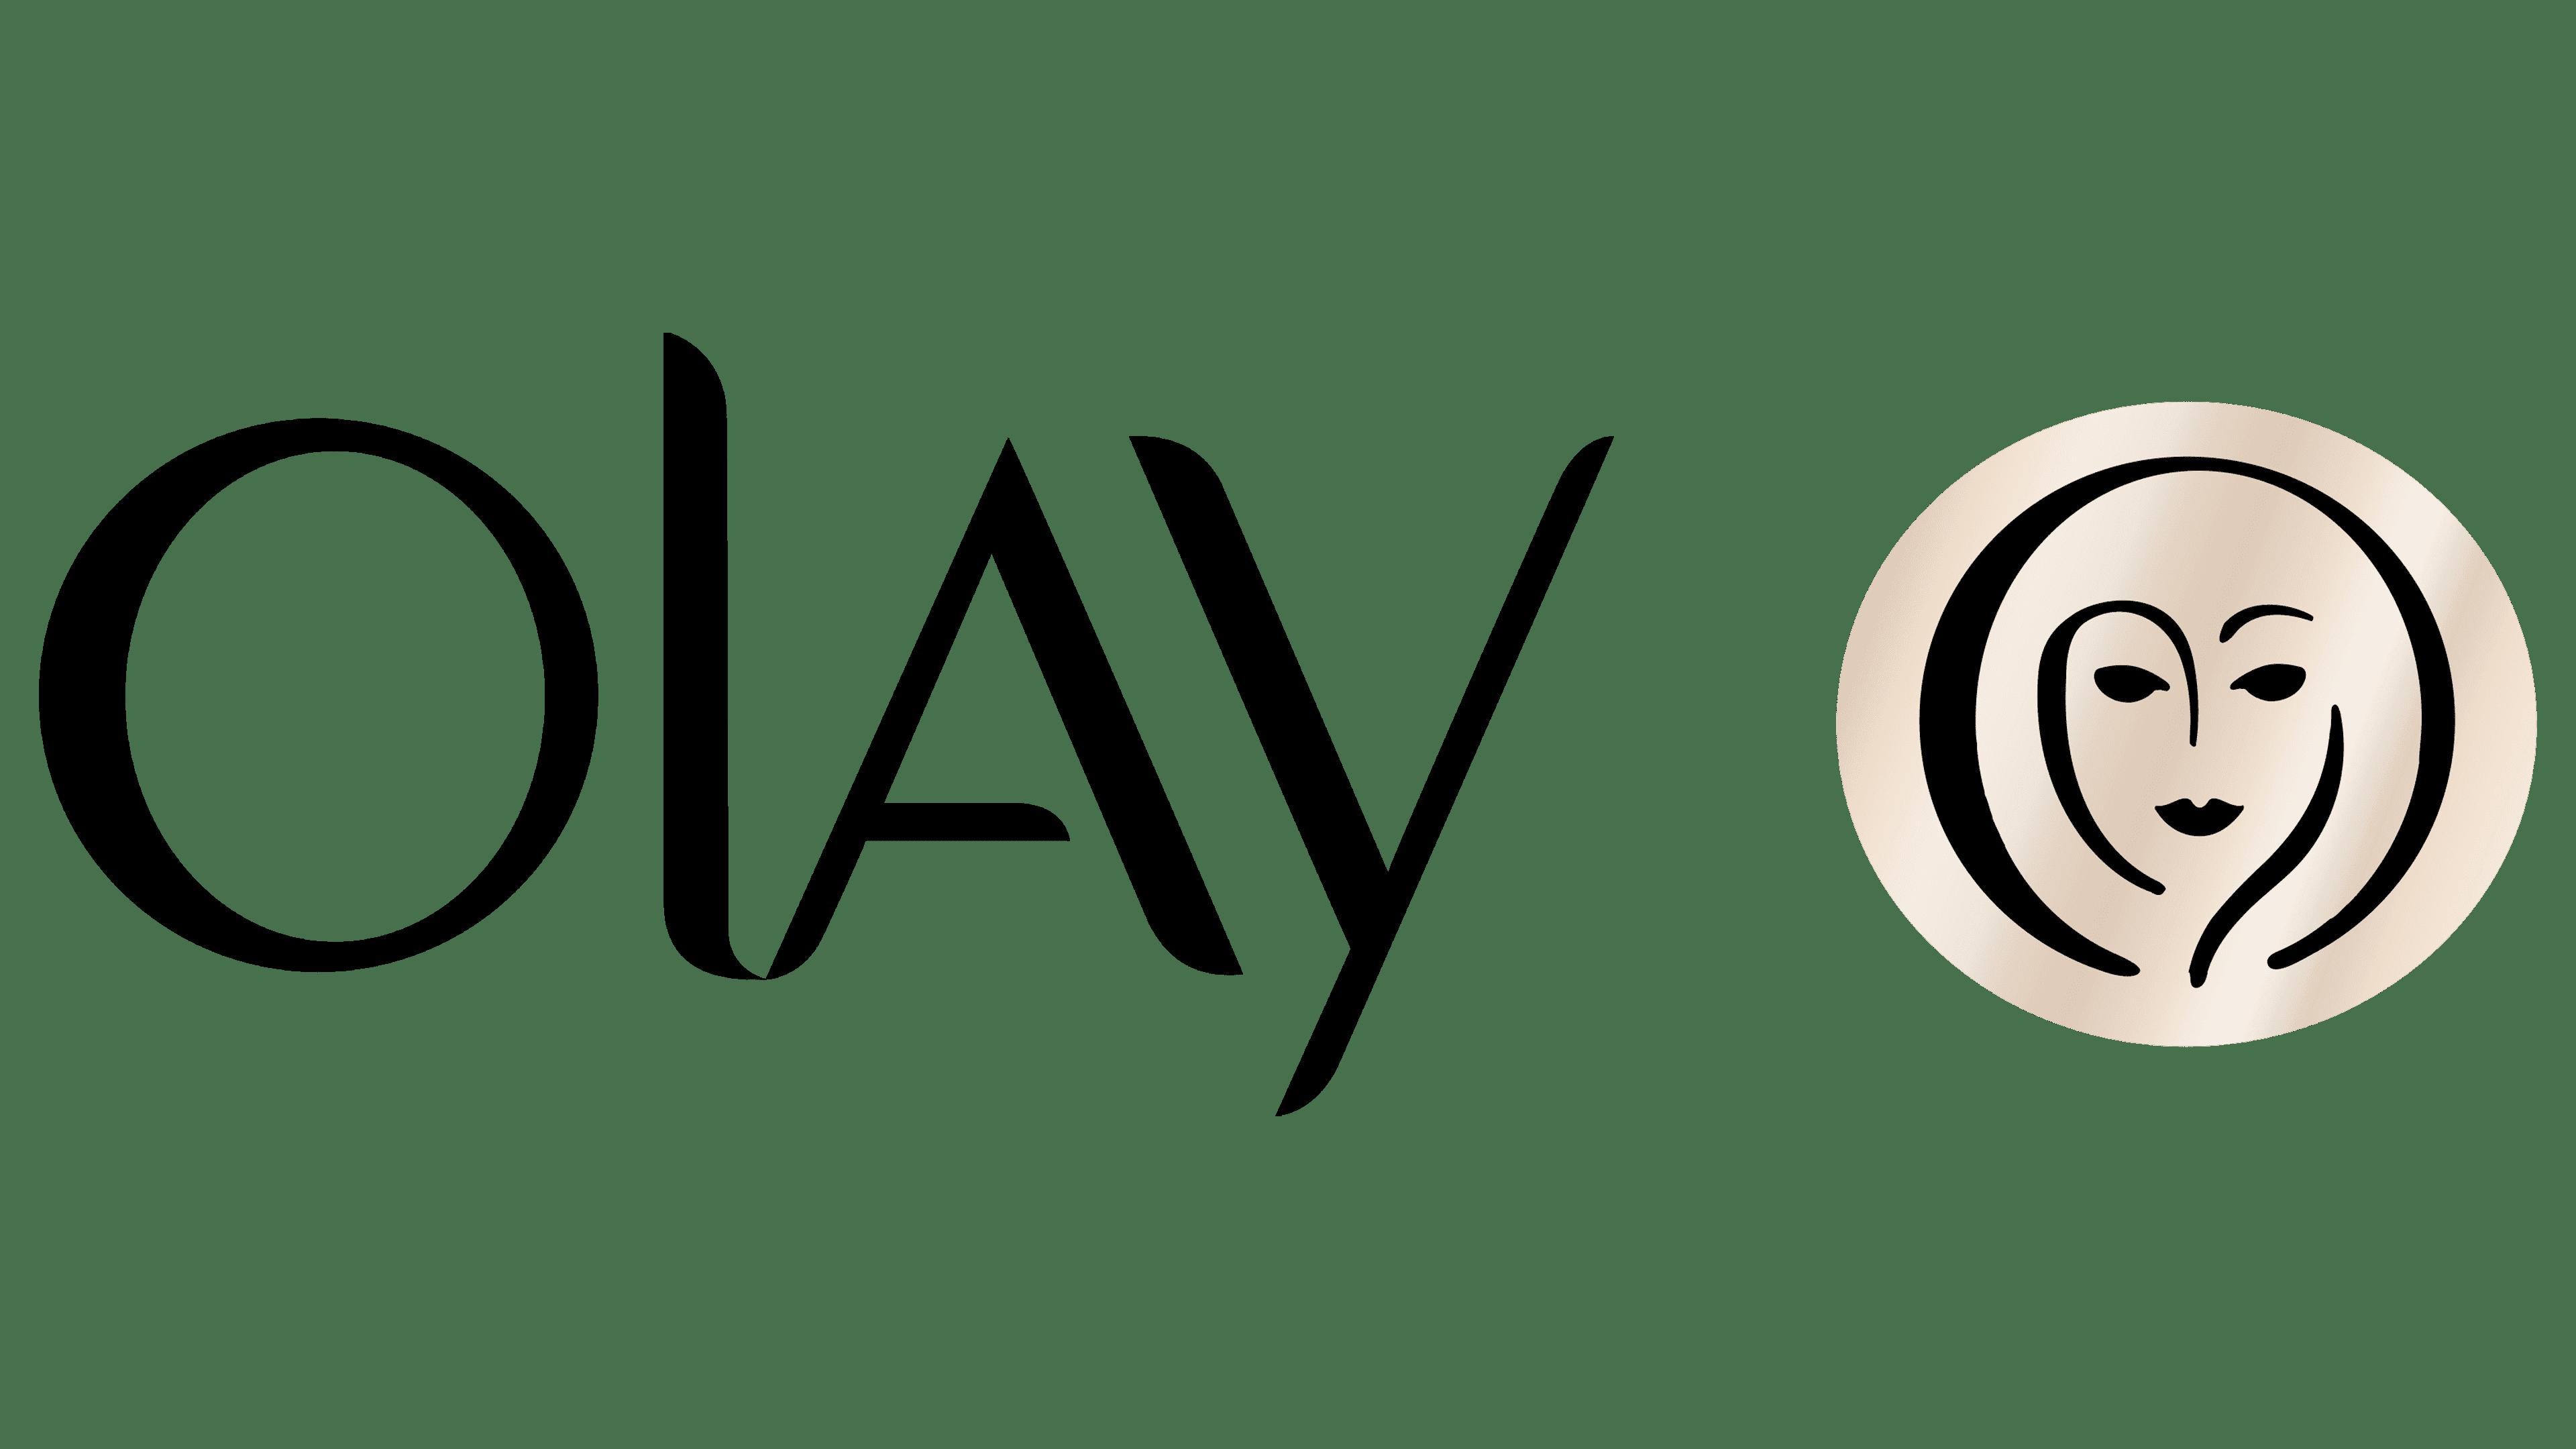 اولاي - OLAY